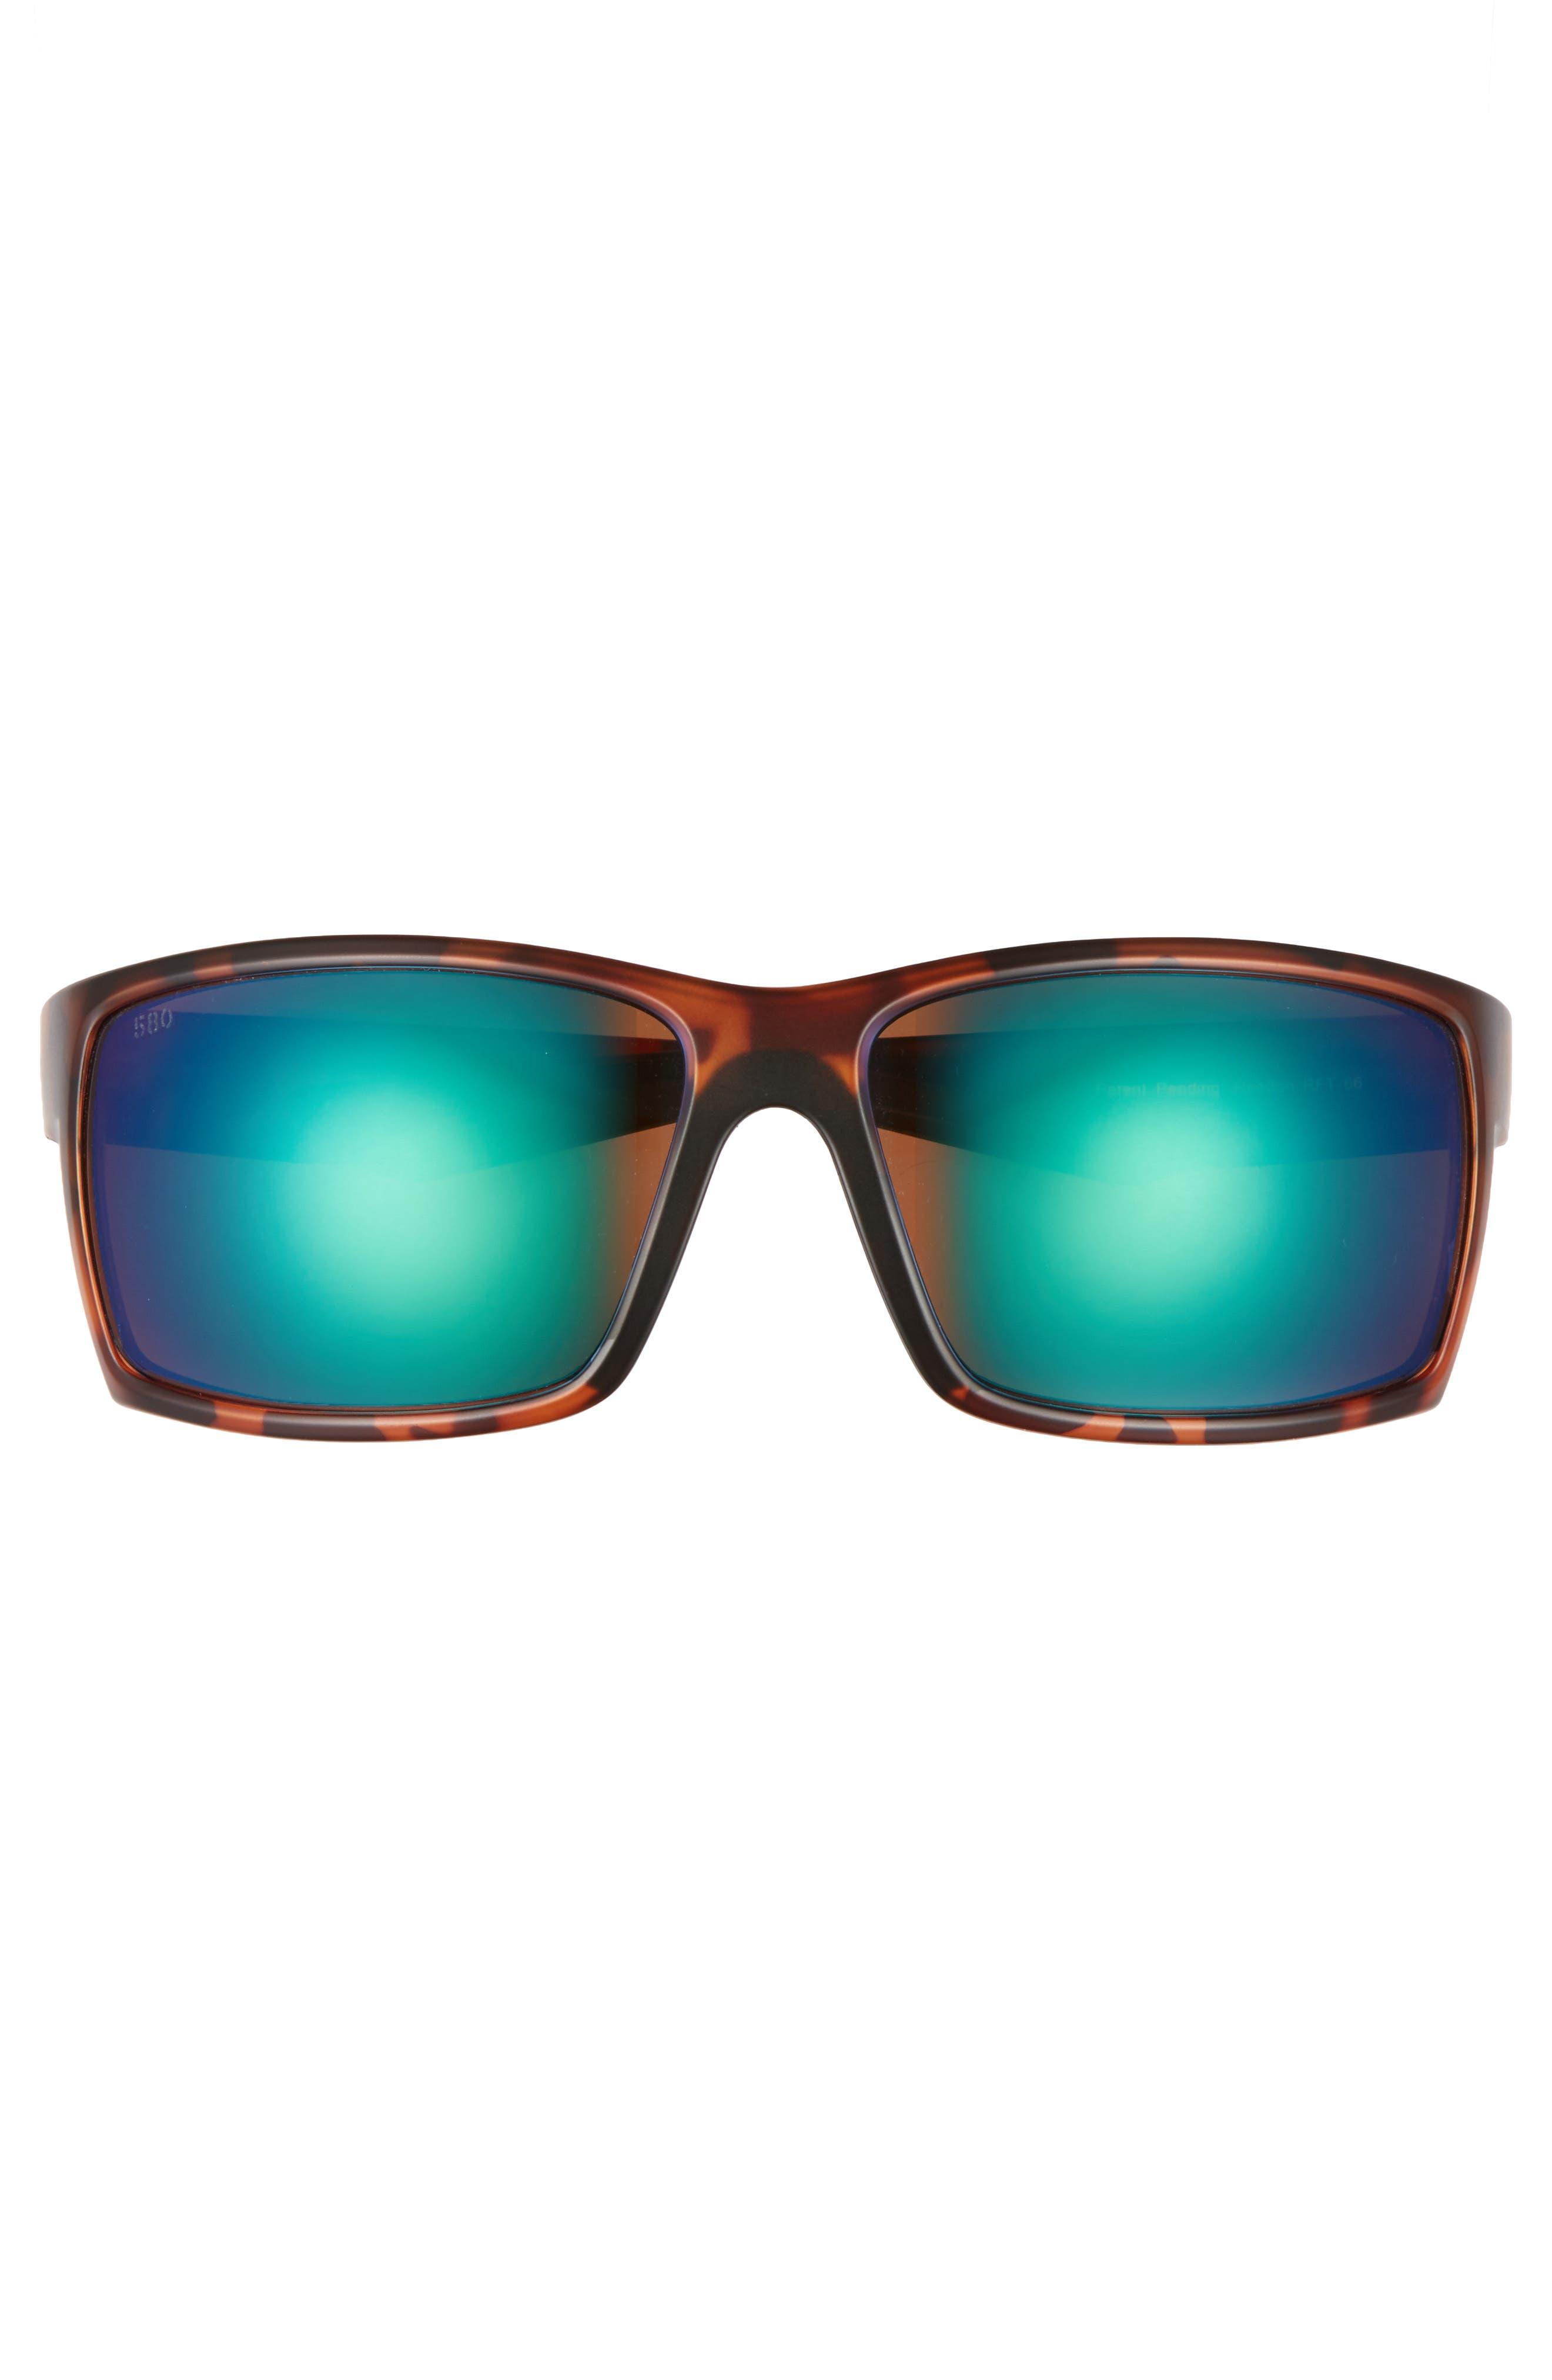 Reefton 65mm Polarized Sunglasses,                             Alternate thumbnail 2, color,                             Tortoise/ Green Mirror